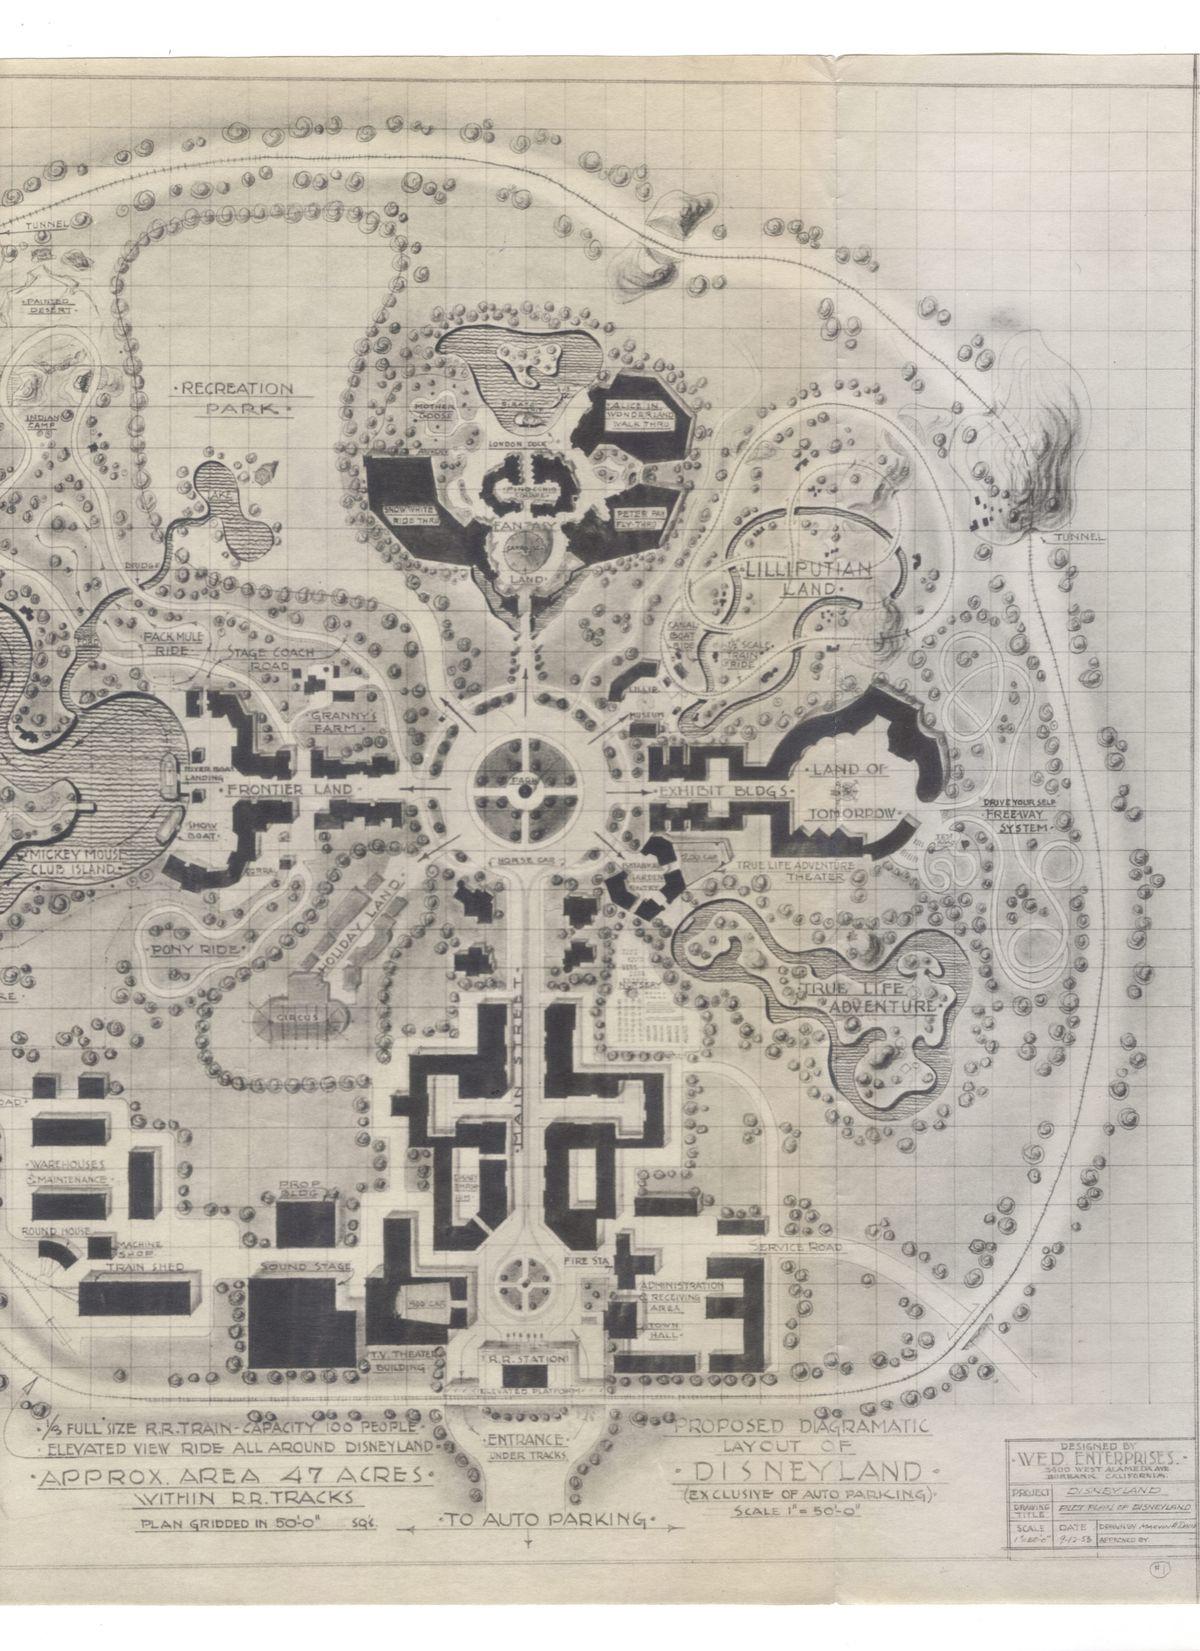 Disneyland prospectus map